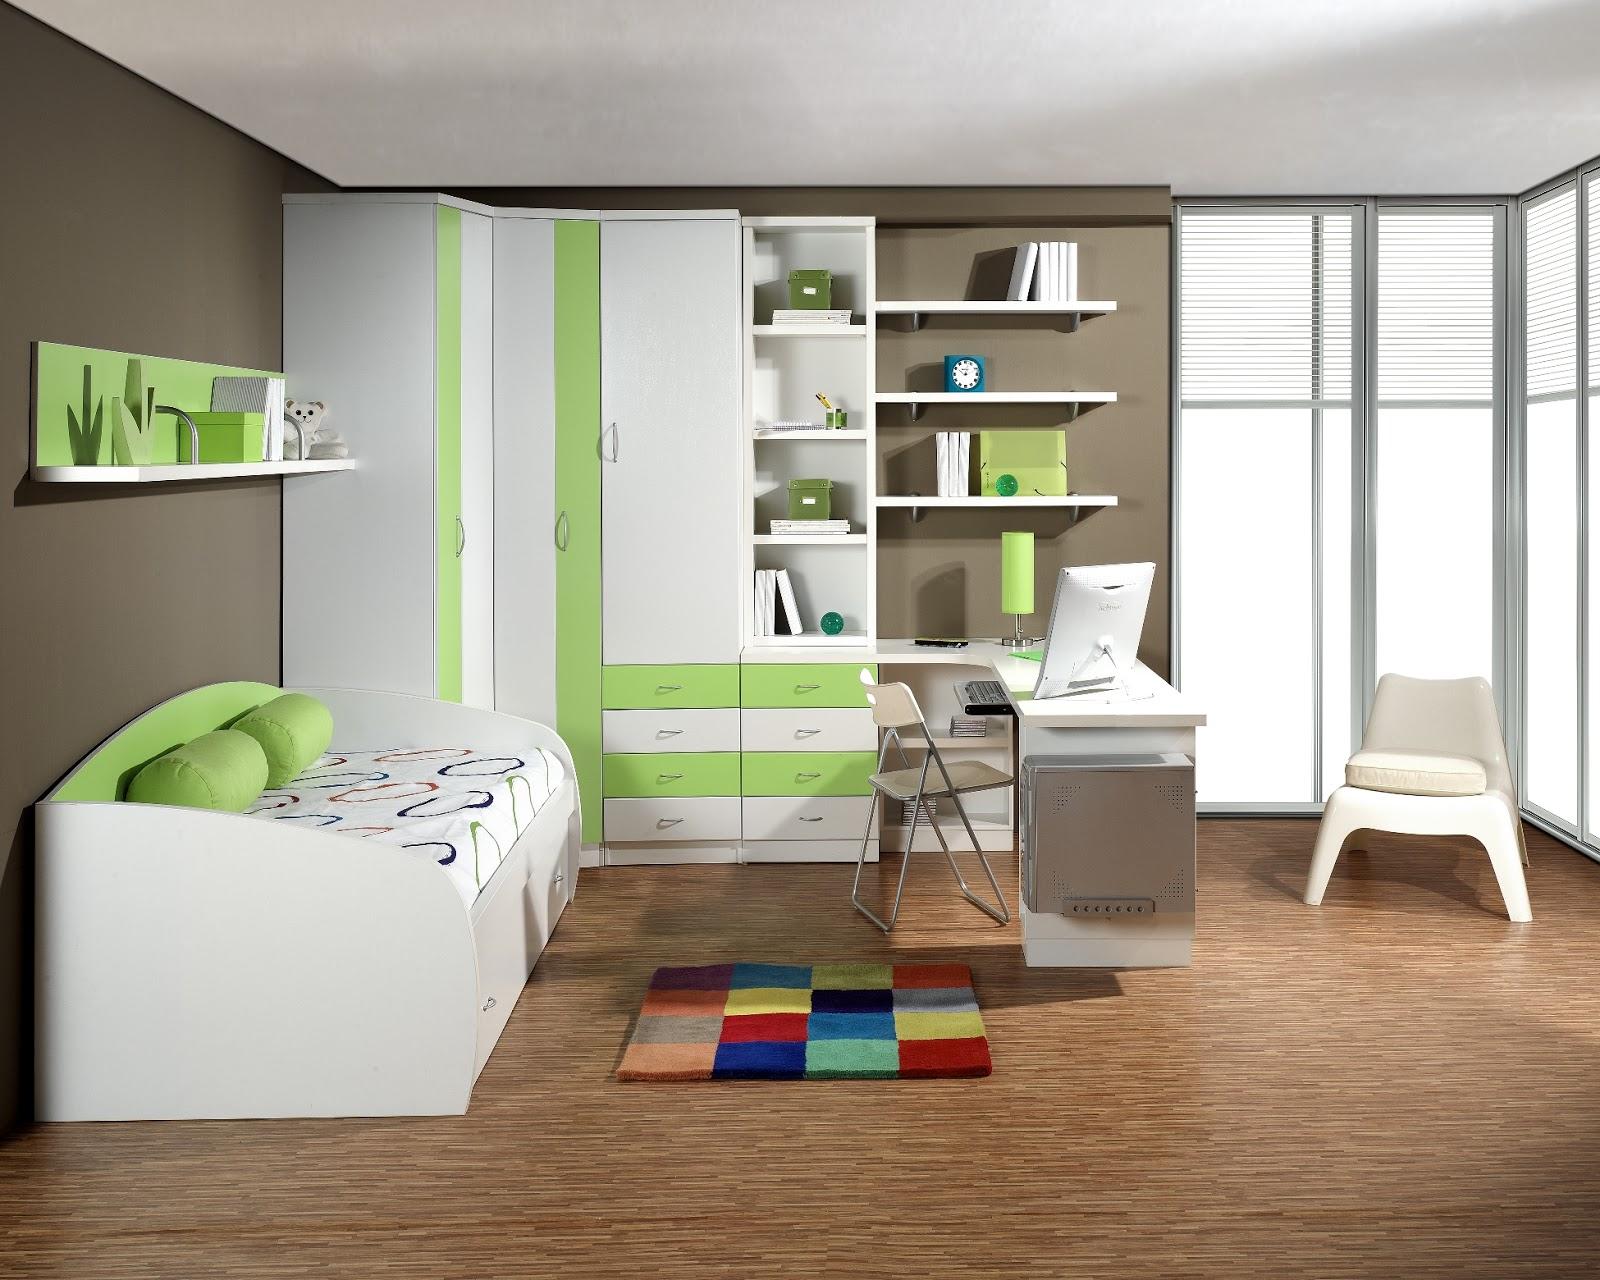 Dormitorios Juveniles Espacios Reducidos Dormitorio Juvenil Gama  # Giessegi Muebles Infantil